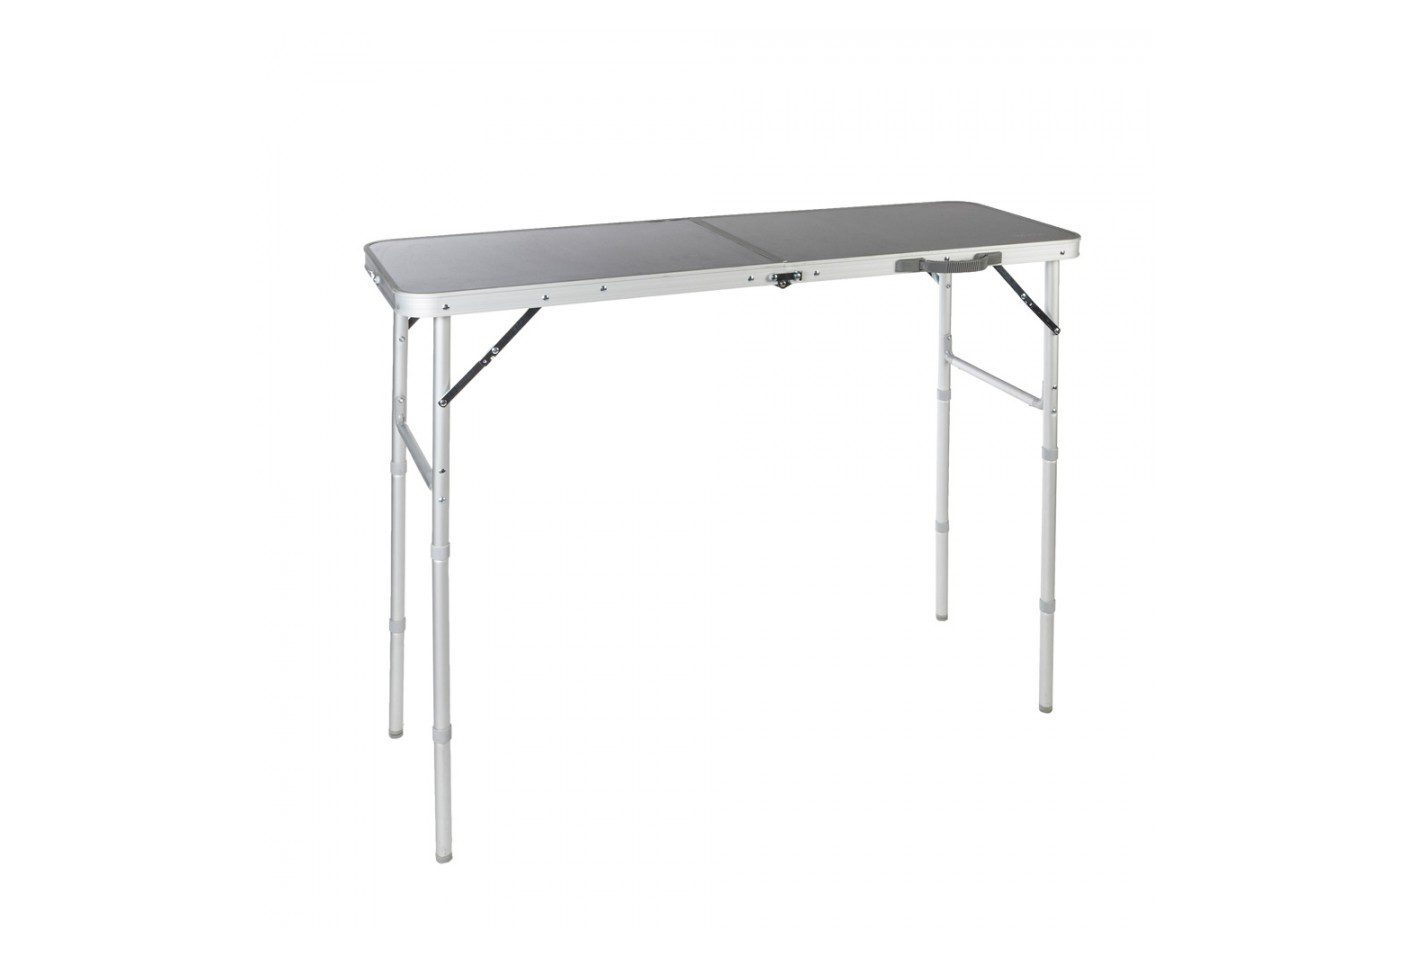 Vango Granite Duo Table 120cm high table